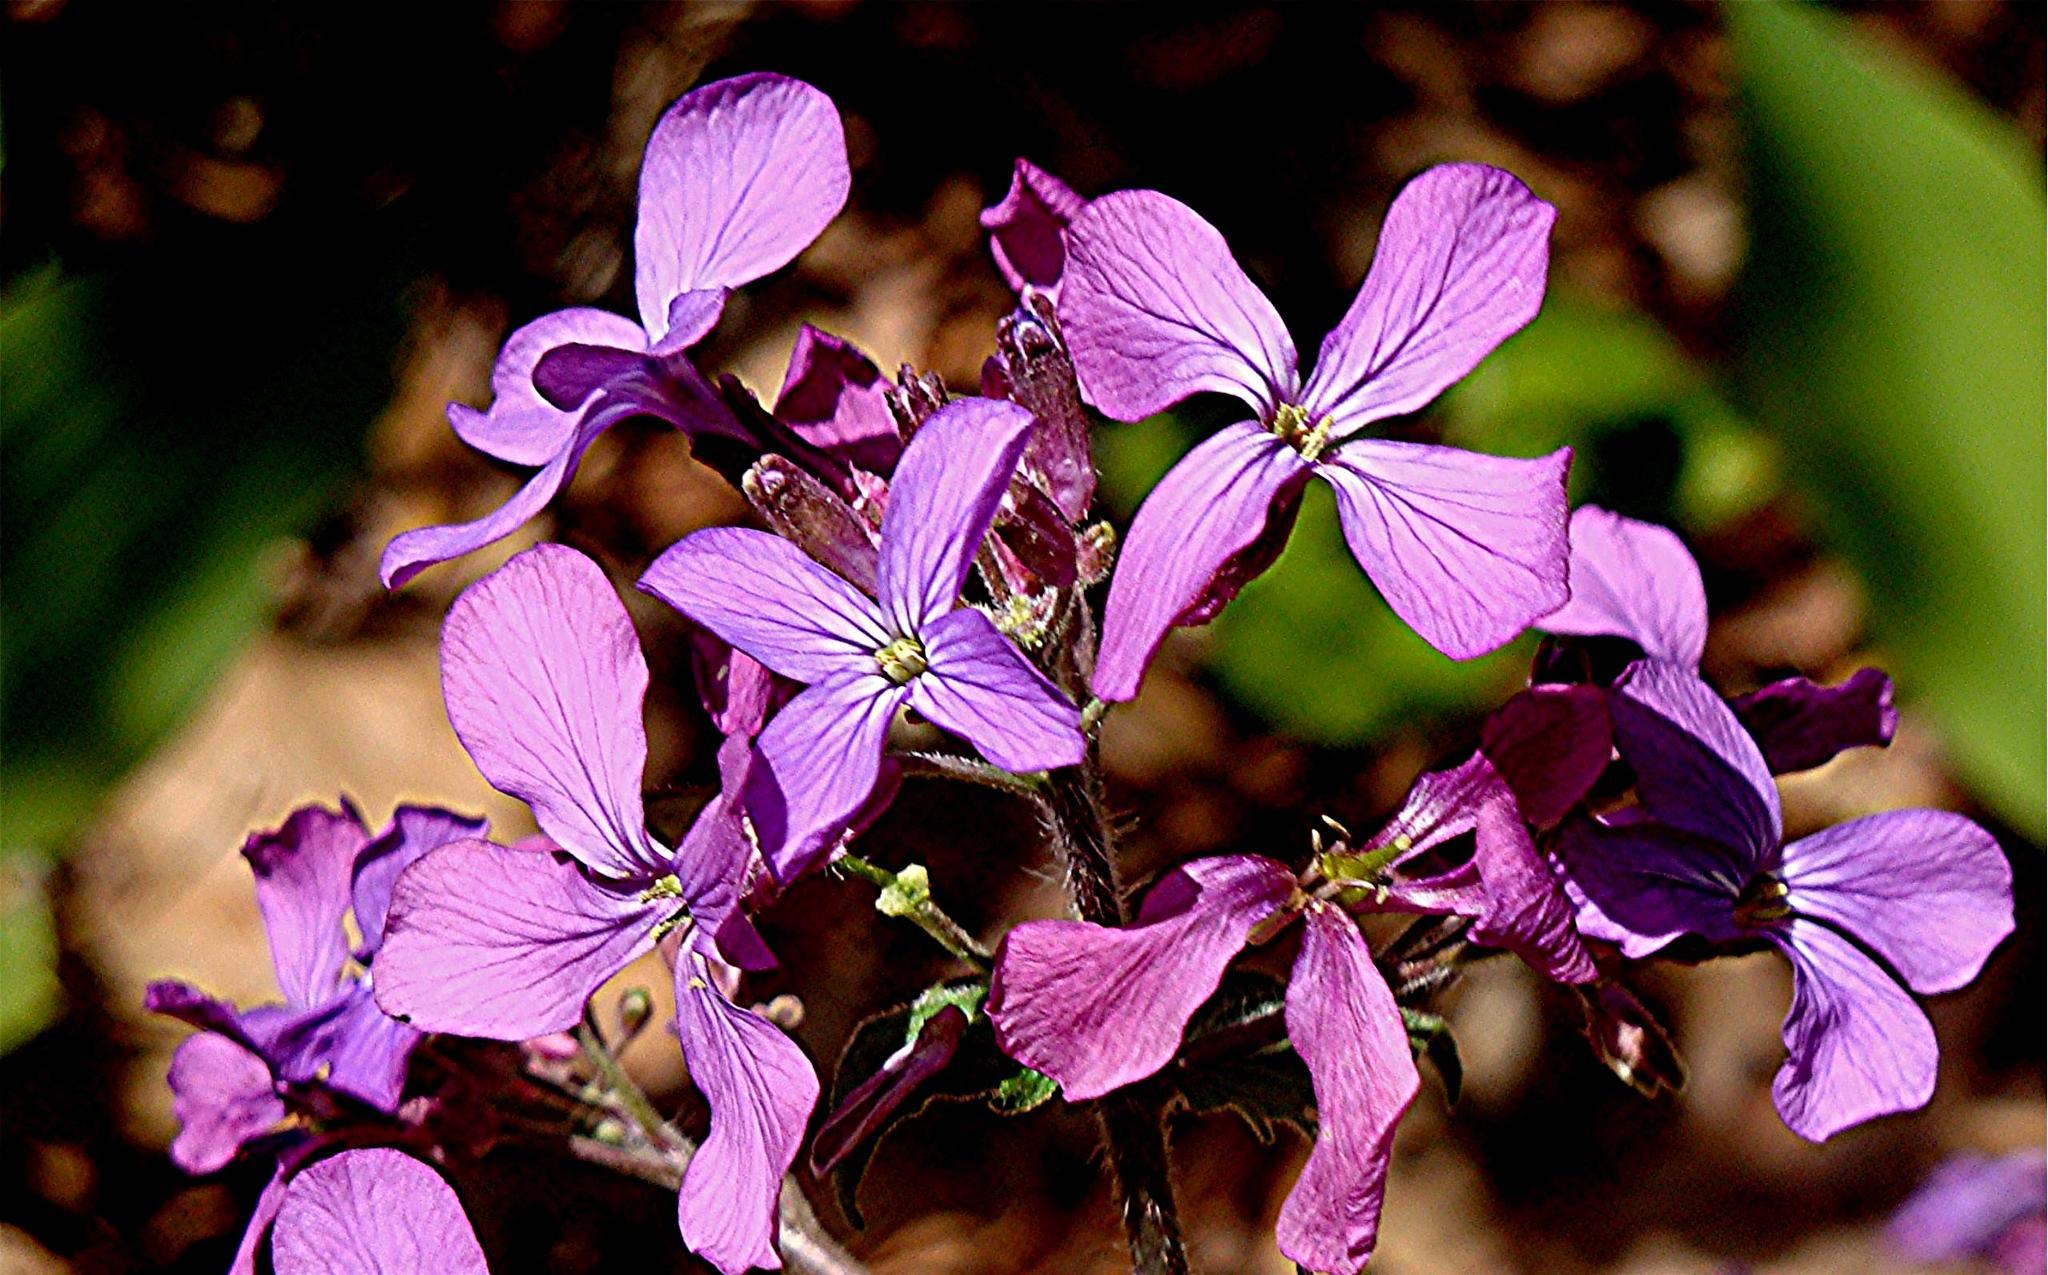 Purple Passion by Joeski